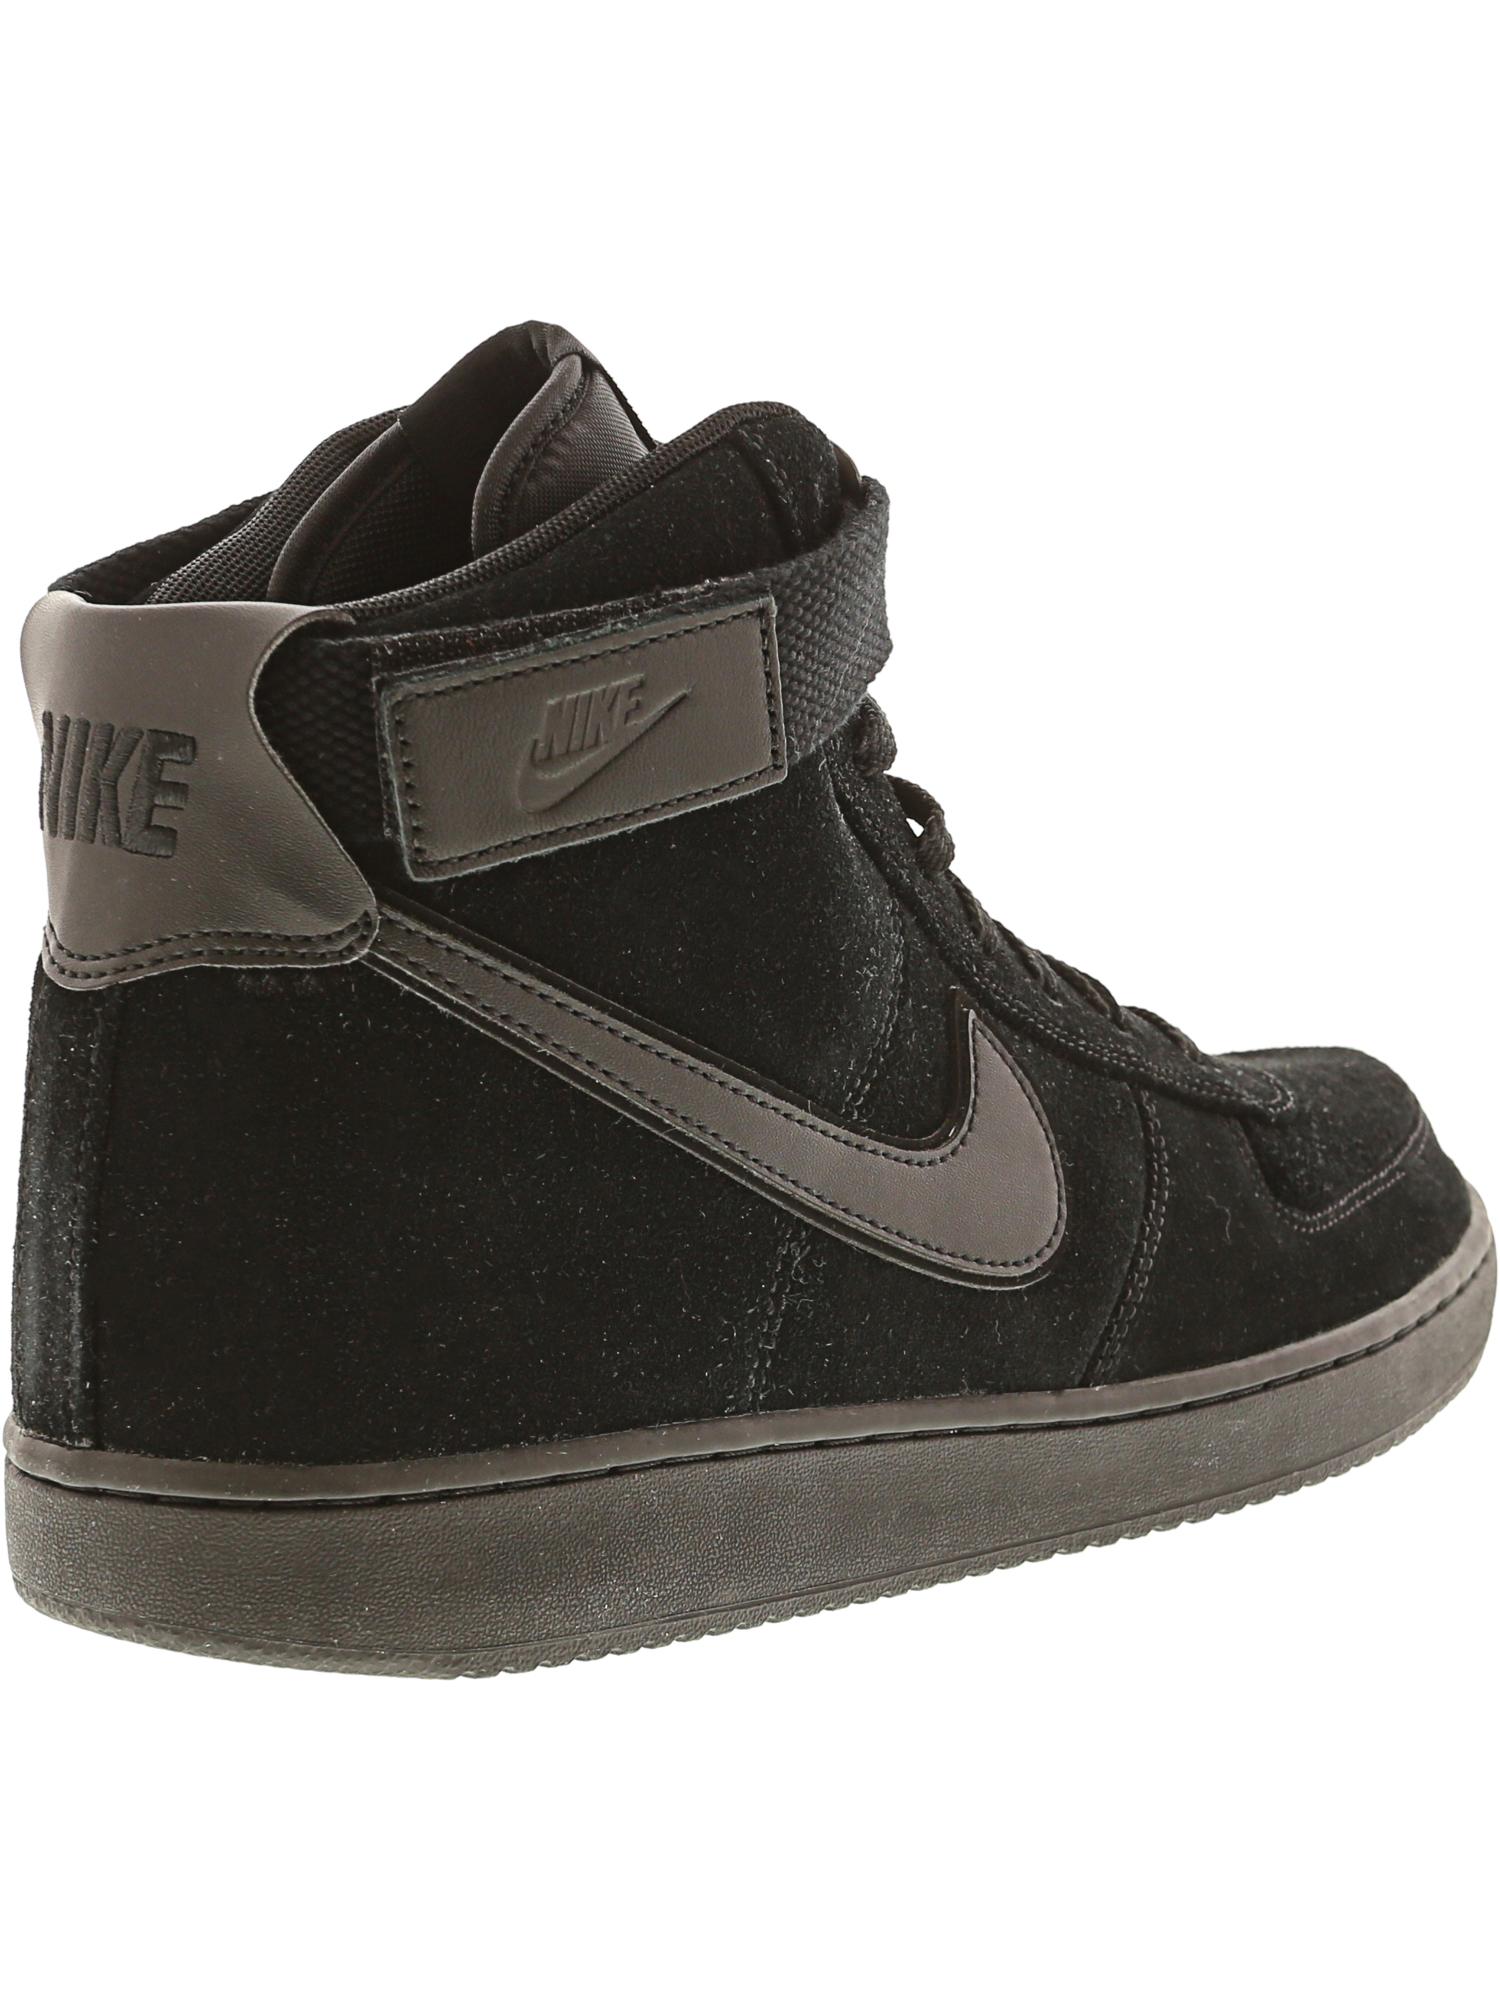 a85ff254339 Nike Men s Vandal High Supreme Ltr High-Top Suede Fashion Sneaker